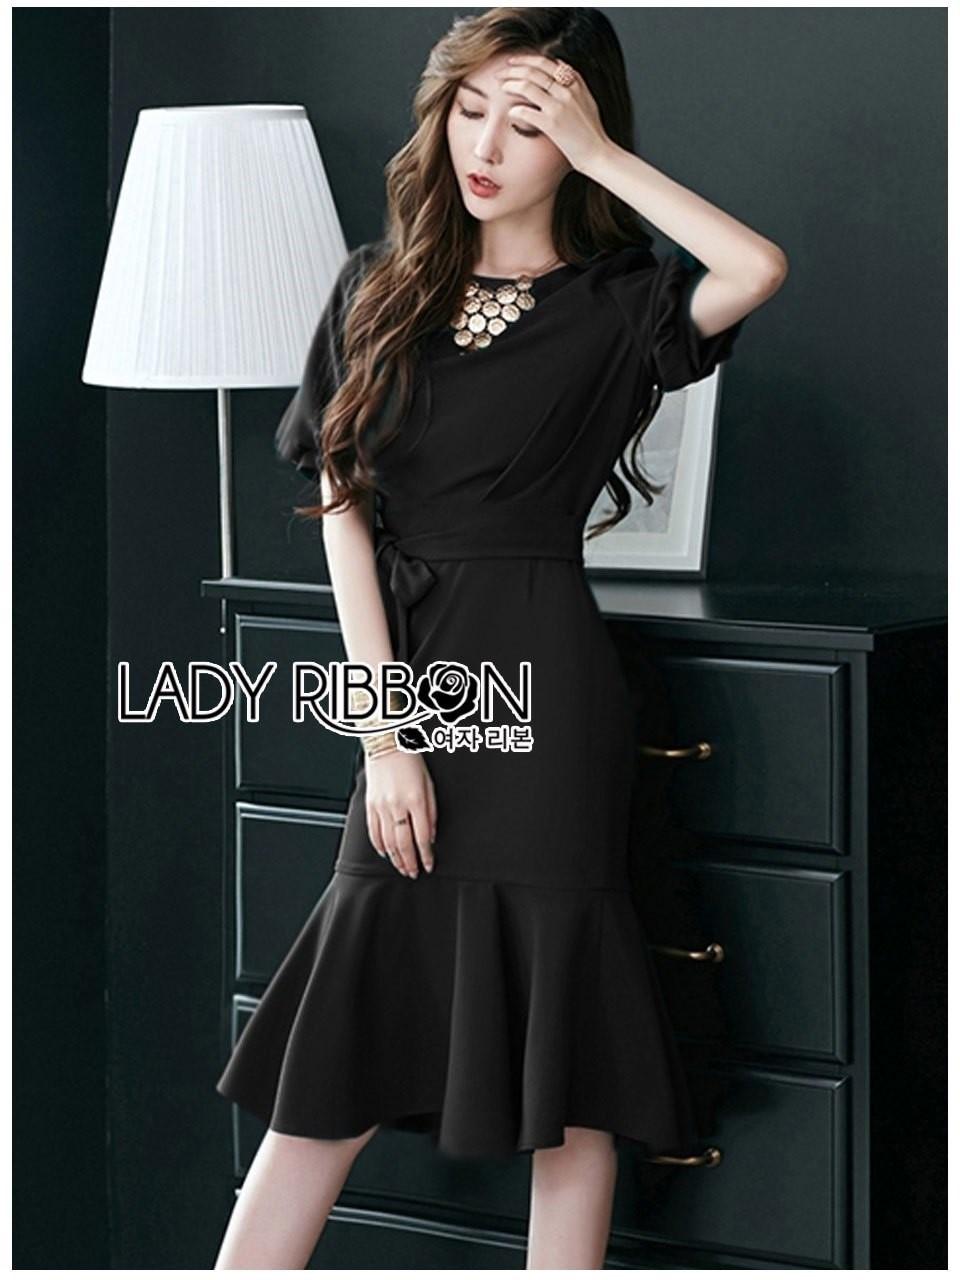 Anastasia Smart Casual Black Peplum Dress